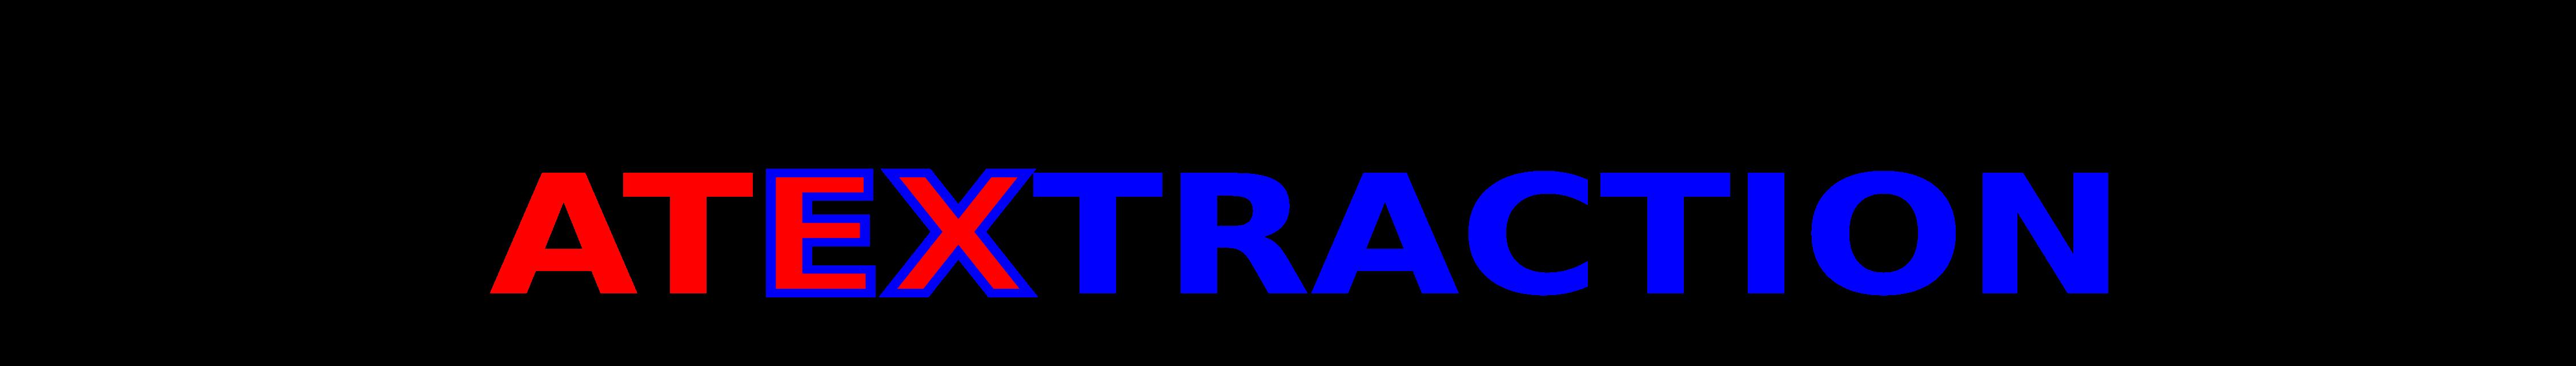 AtexTraction8